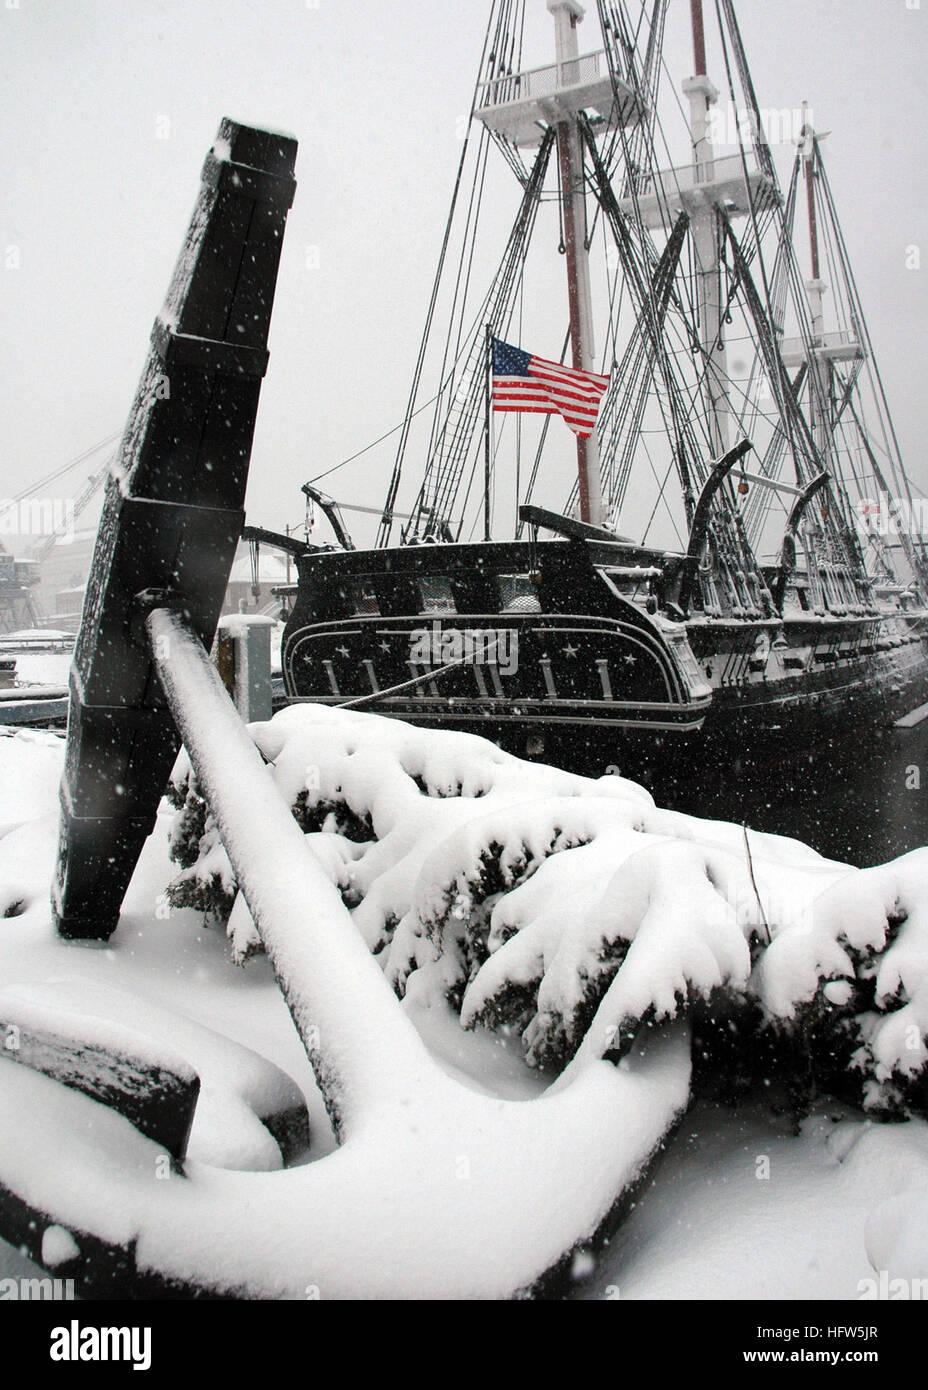 080114-N-2893B-002 de Charlestown, Massachusetts (Ene. 14, 2008) La Primera gran nevada del año nuevo mantas Imagen De Stock